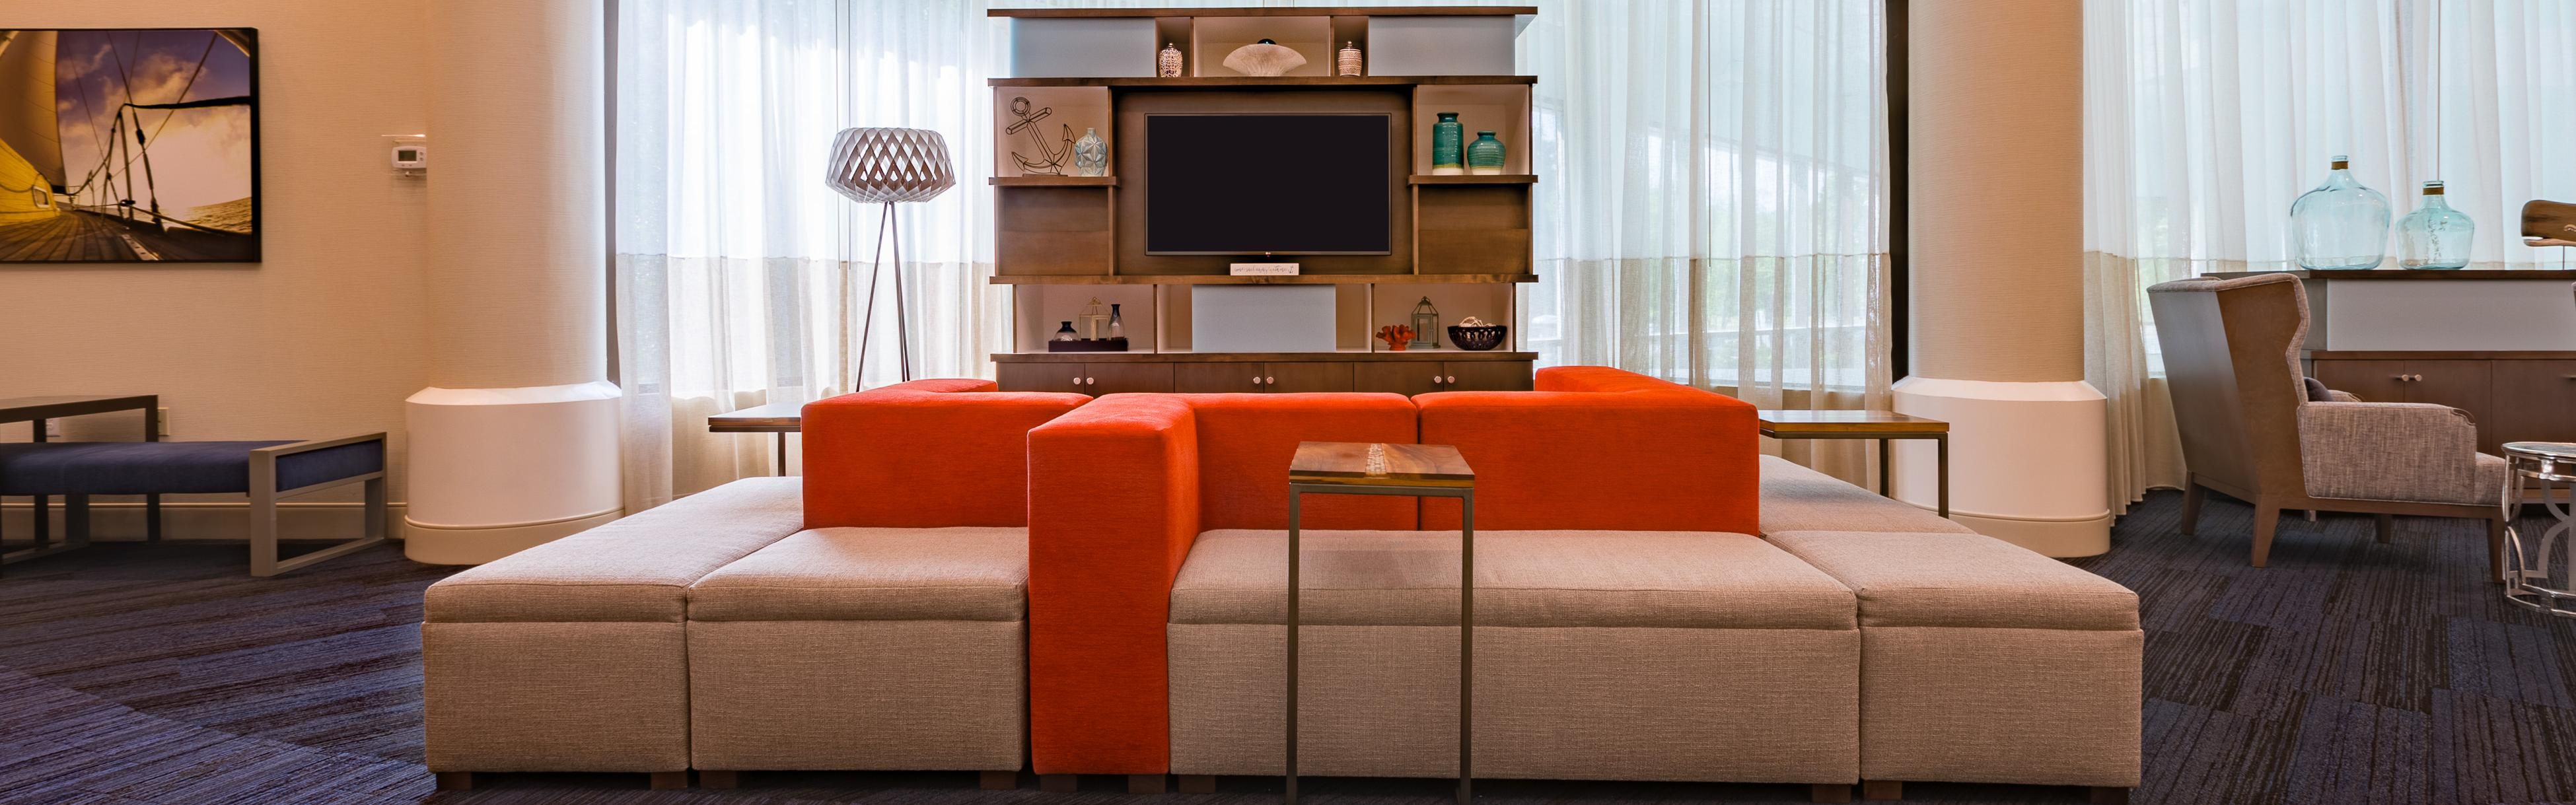 holiday inn newport news city center hotel by ihg rh ihg com holiday inn newport news city center holiday inn newport news omni blvd